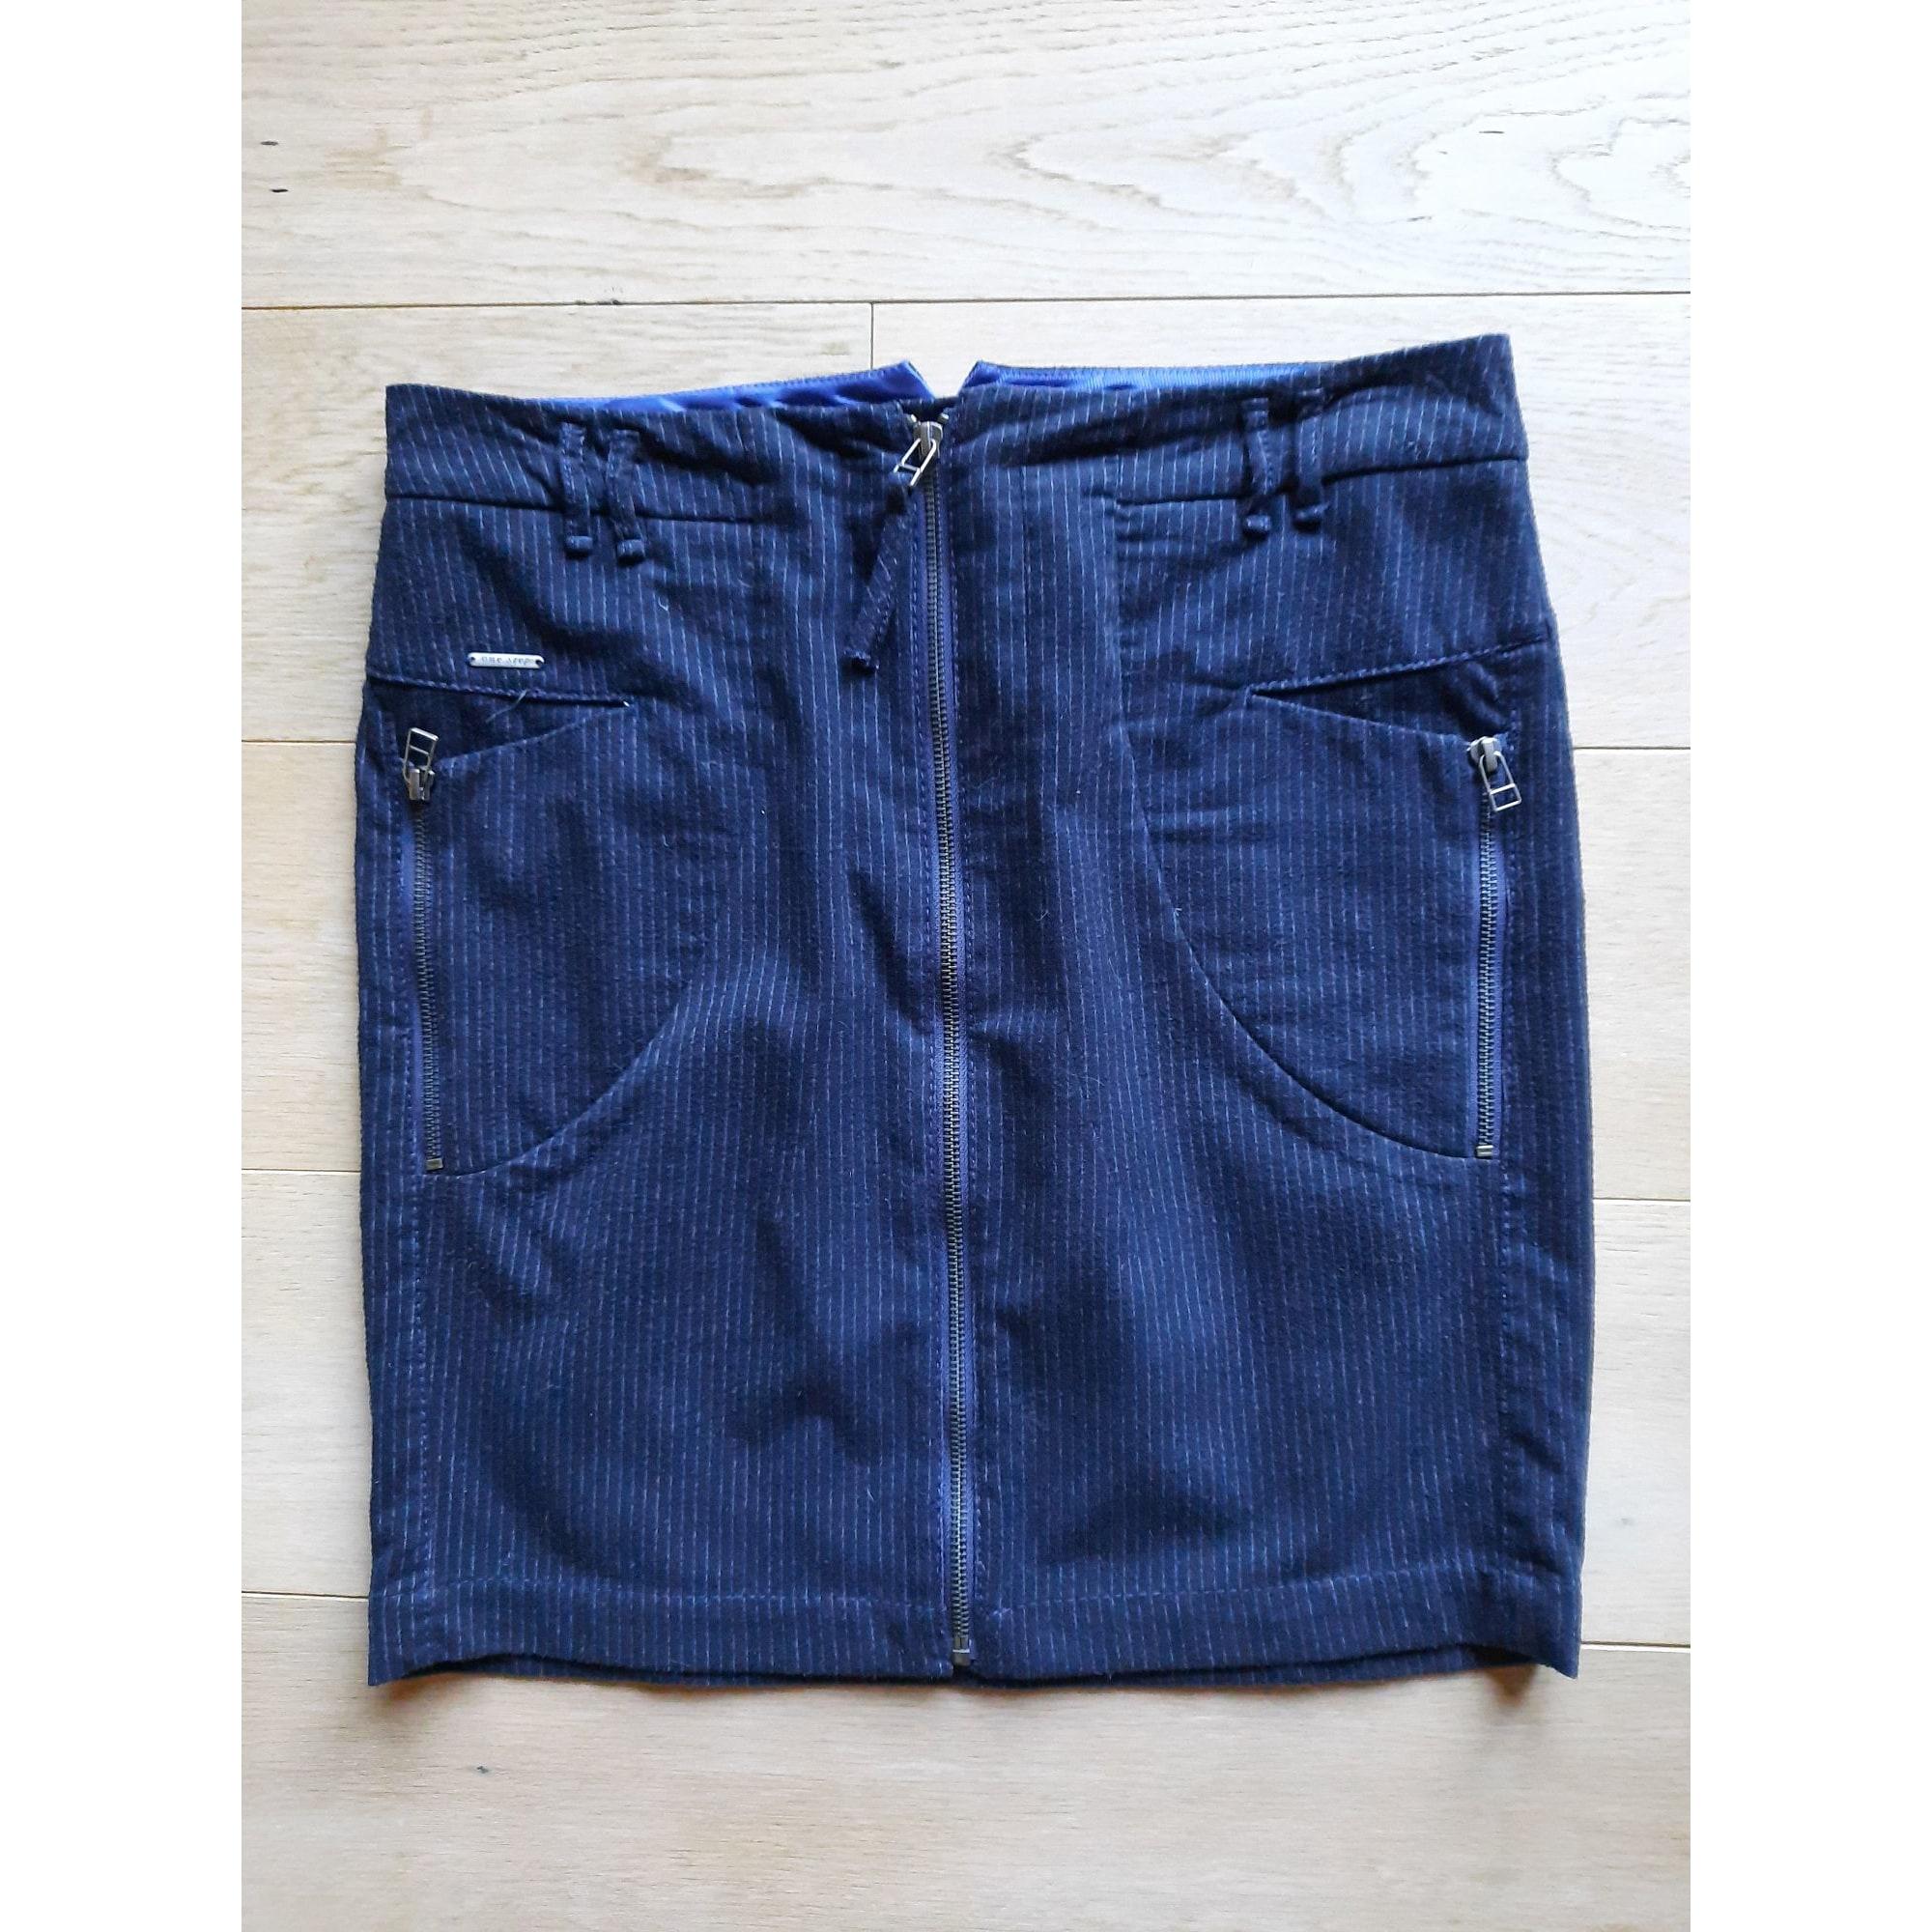 Jupe courte ONE STEP Bleu, bleu marine, bleu turquoise